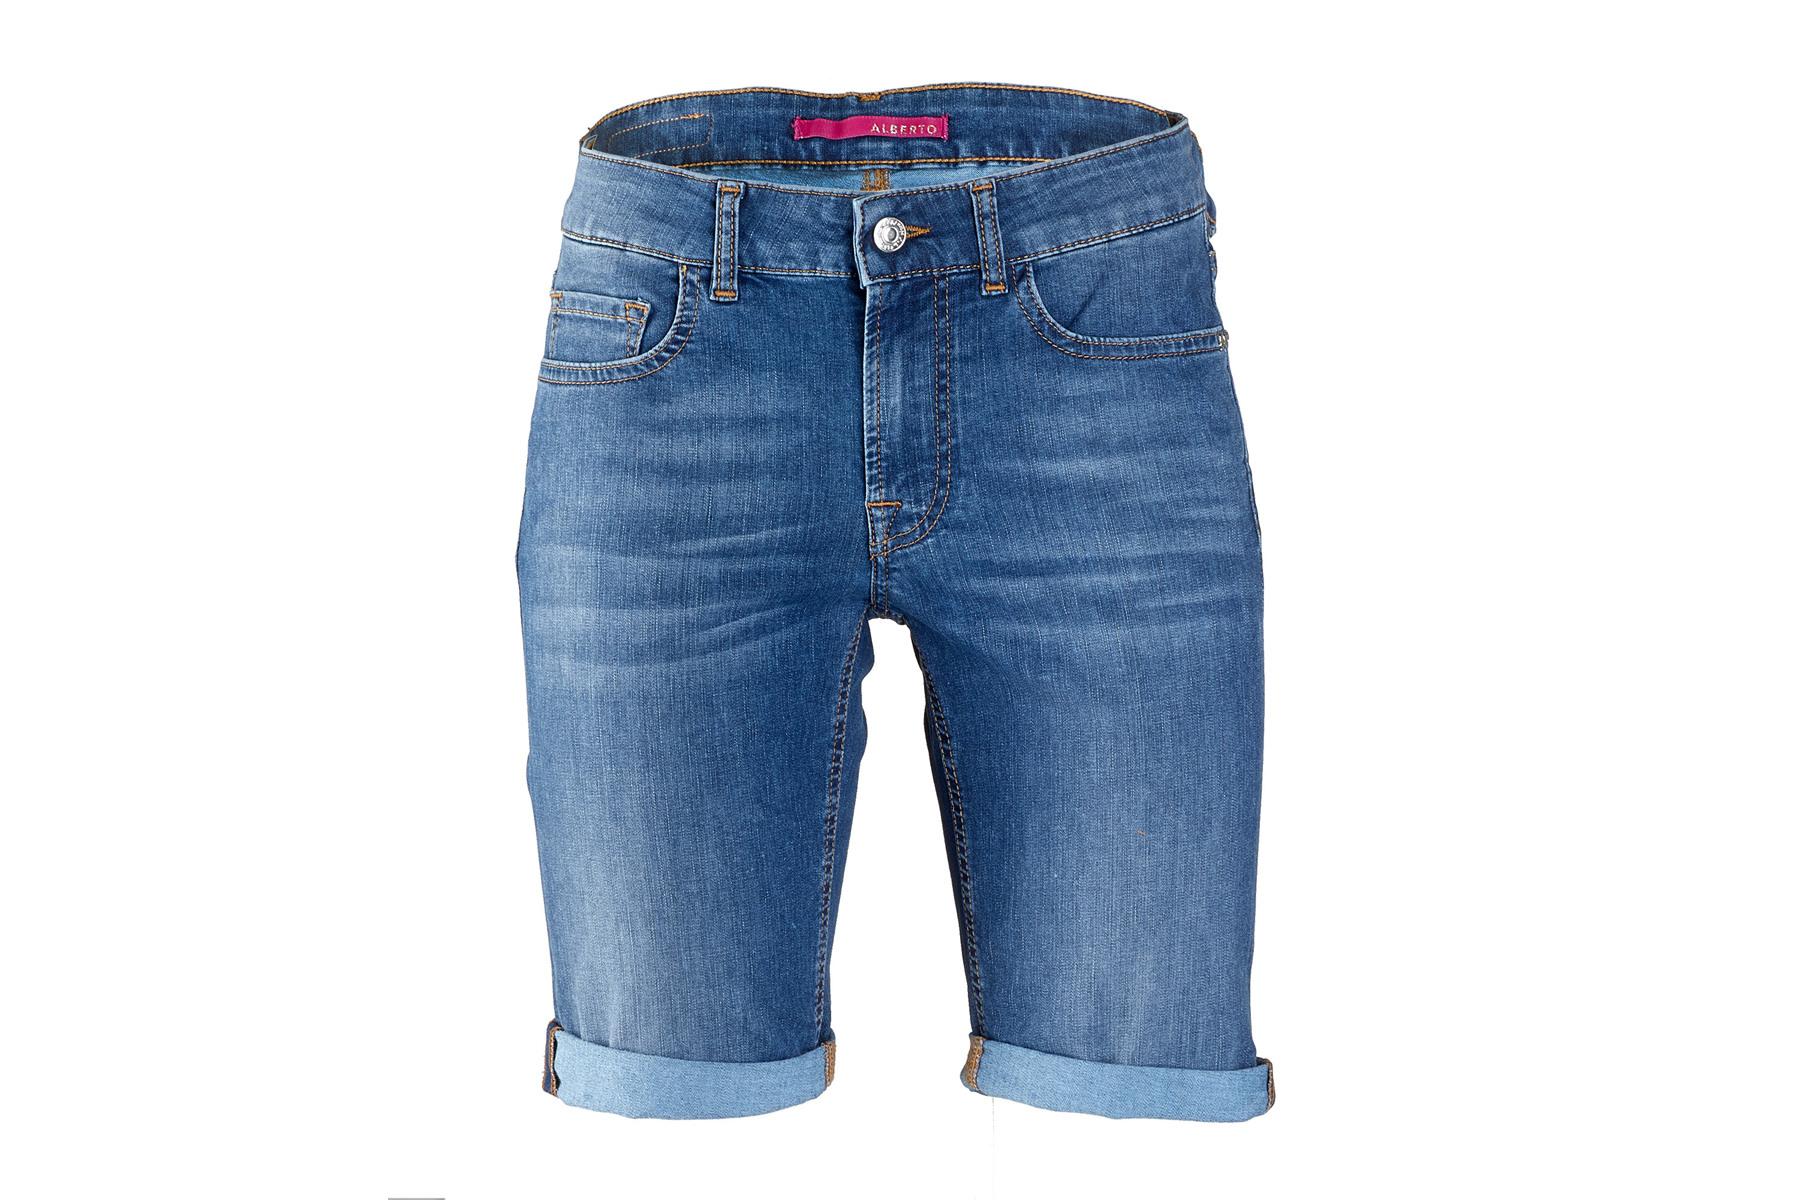 ALBERTO Coolmax Denim Jeans Short Damen Shorts kaufen | ROSE Bikes